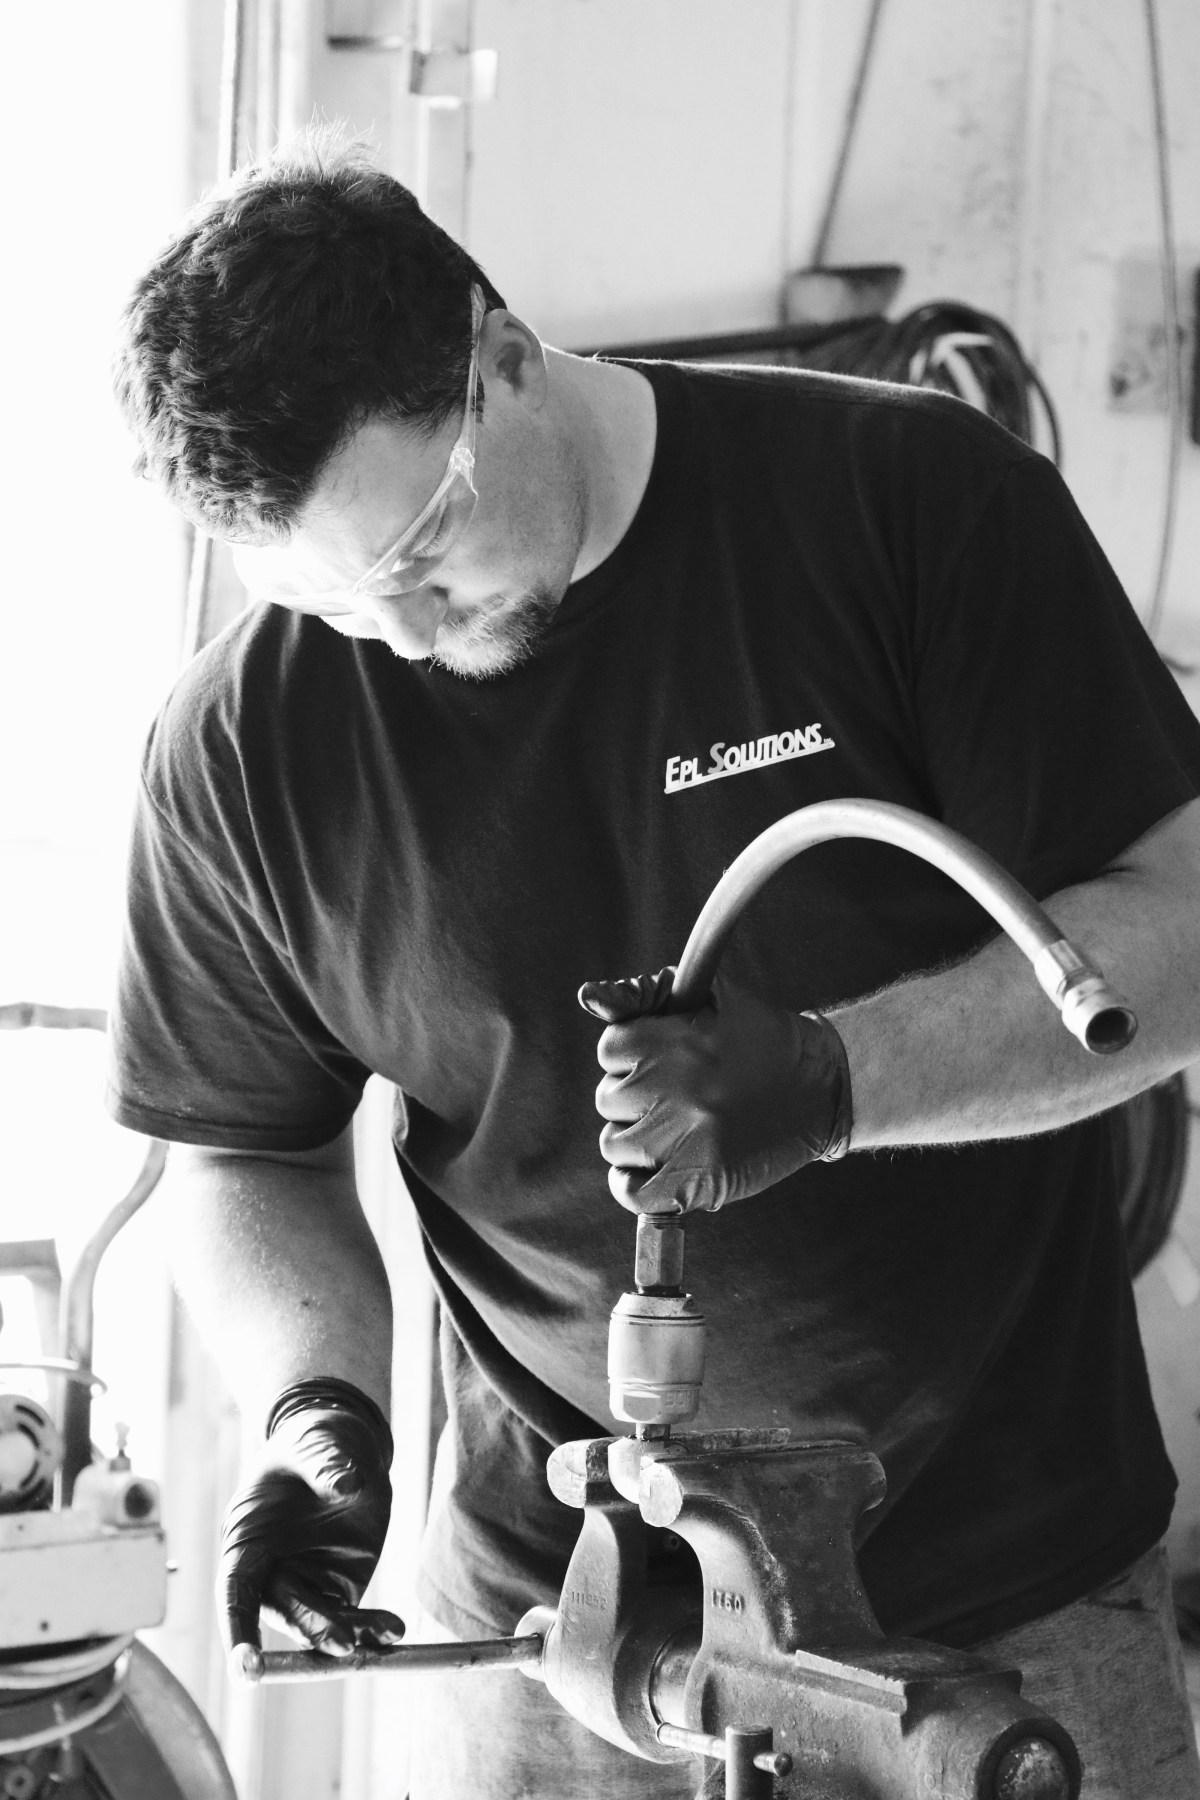 Demonstration of technician repairing warthog nozzle